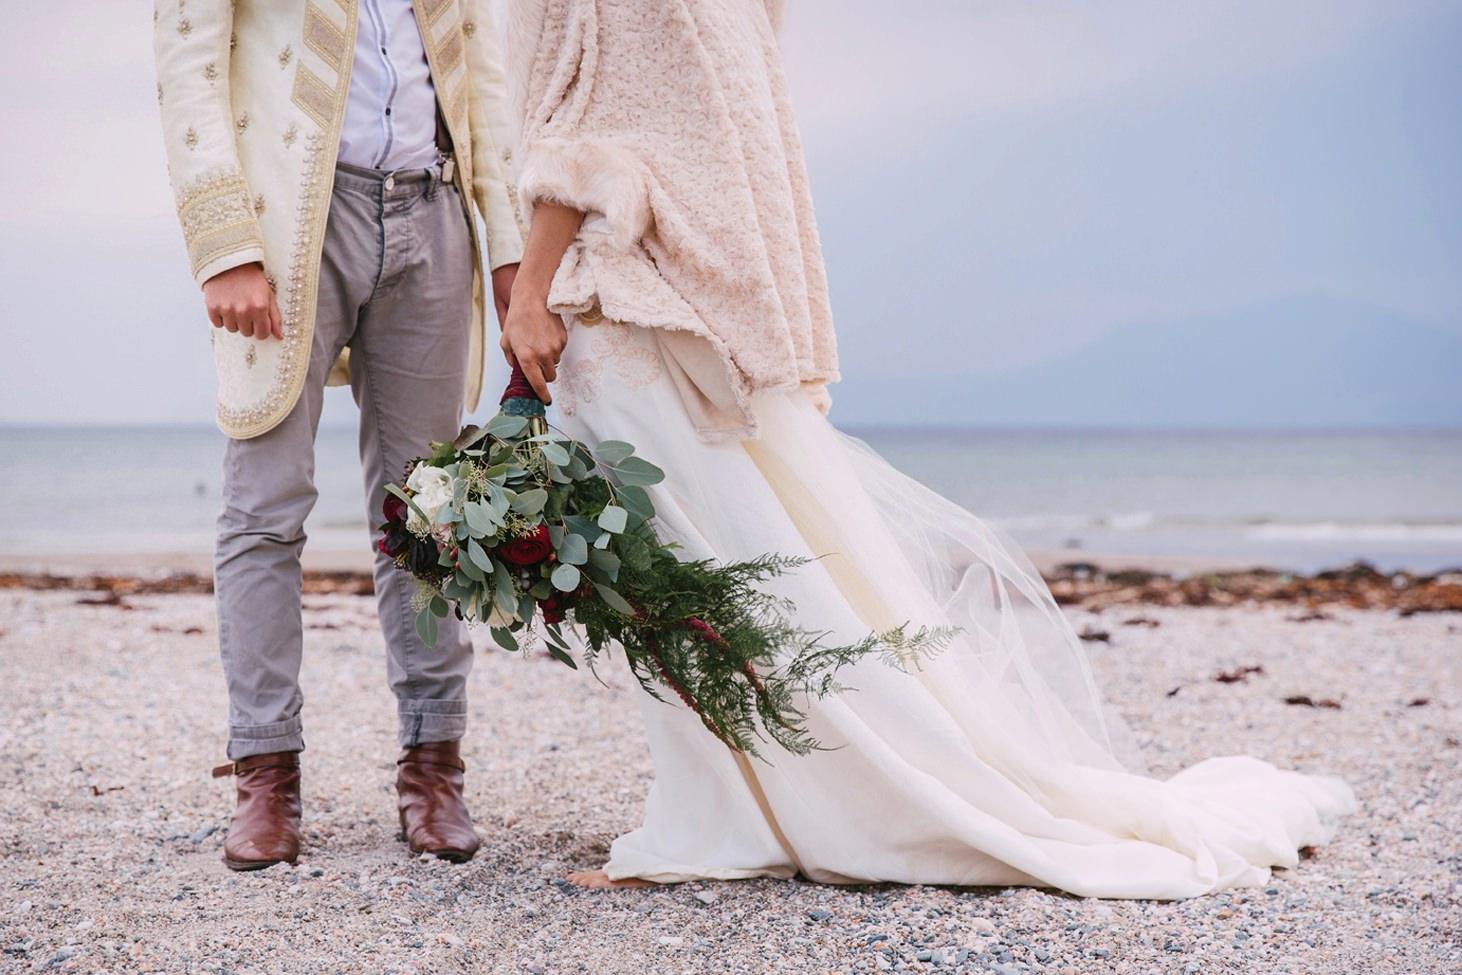 sle of bute wedding photography bride and groom feet